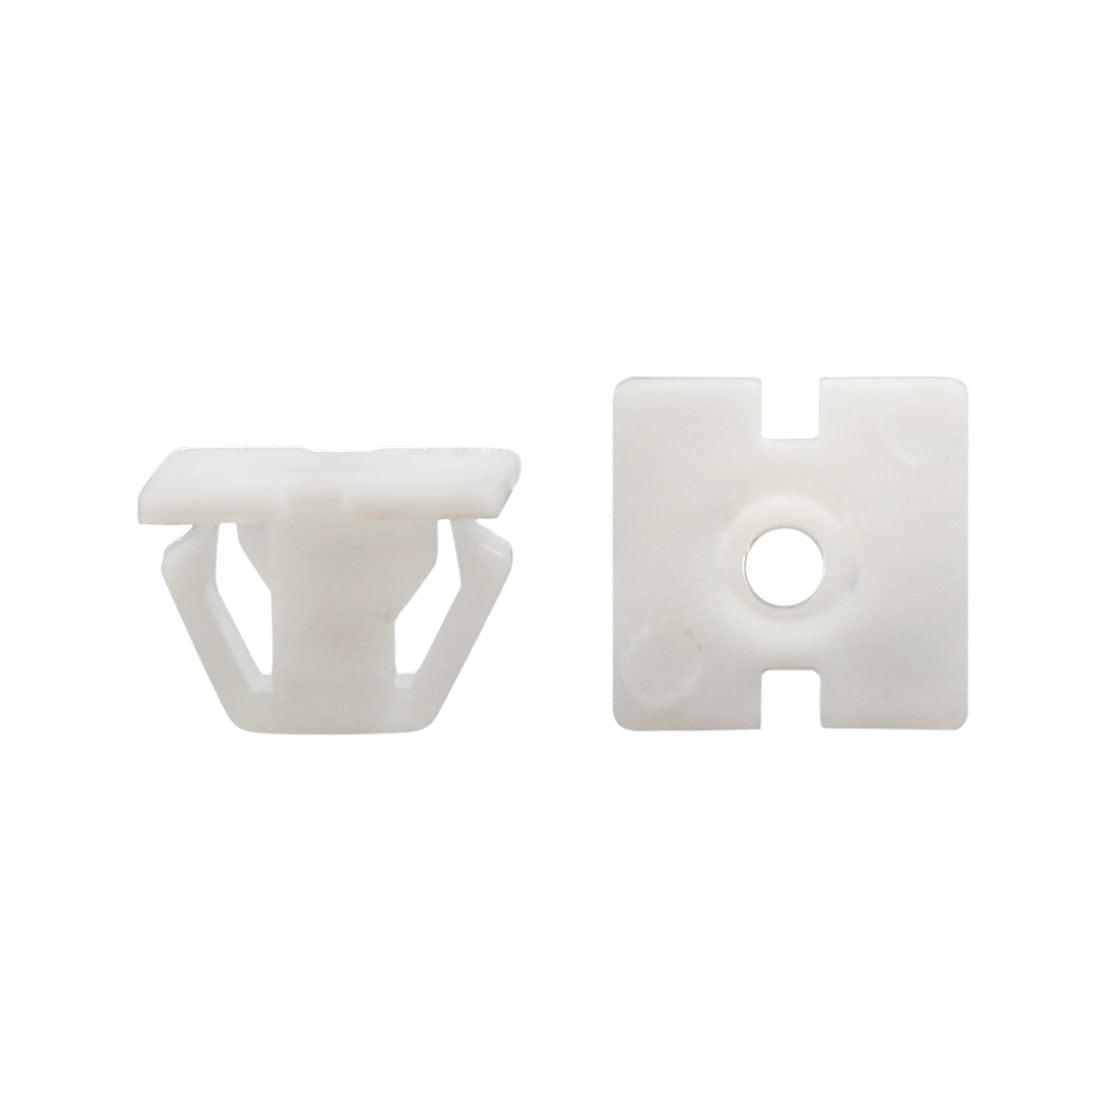 30Pcs Universal Plastic Rivet Fastener Mud Flaps Bumper Fender Clips White 13mm